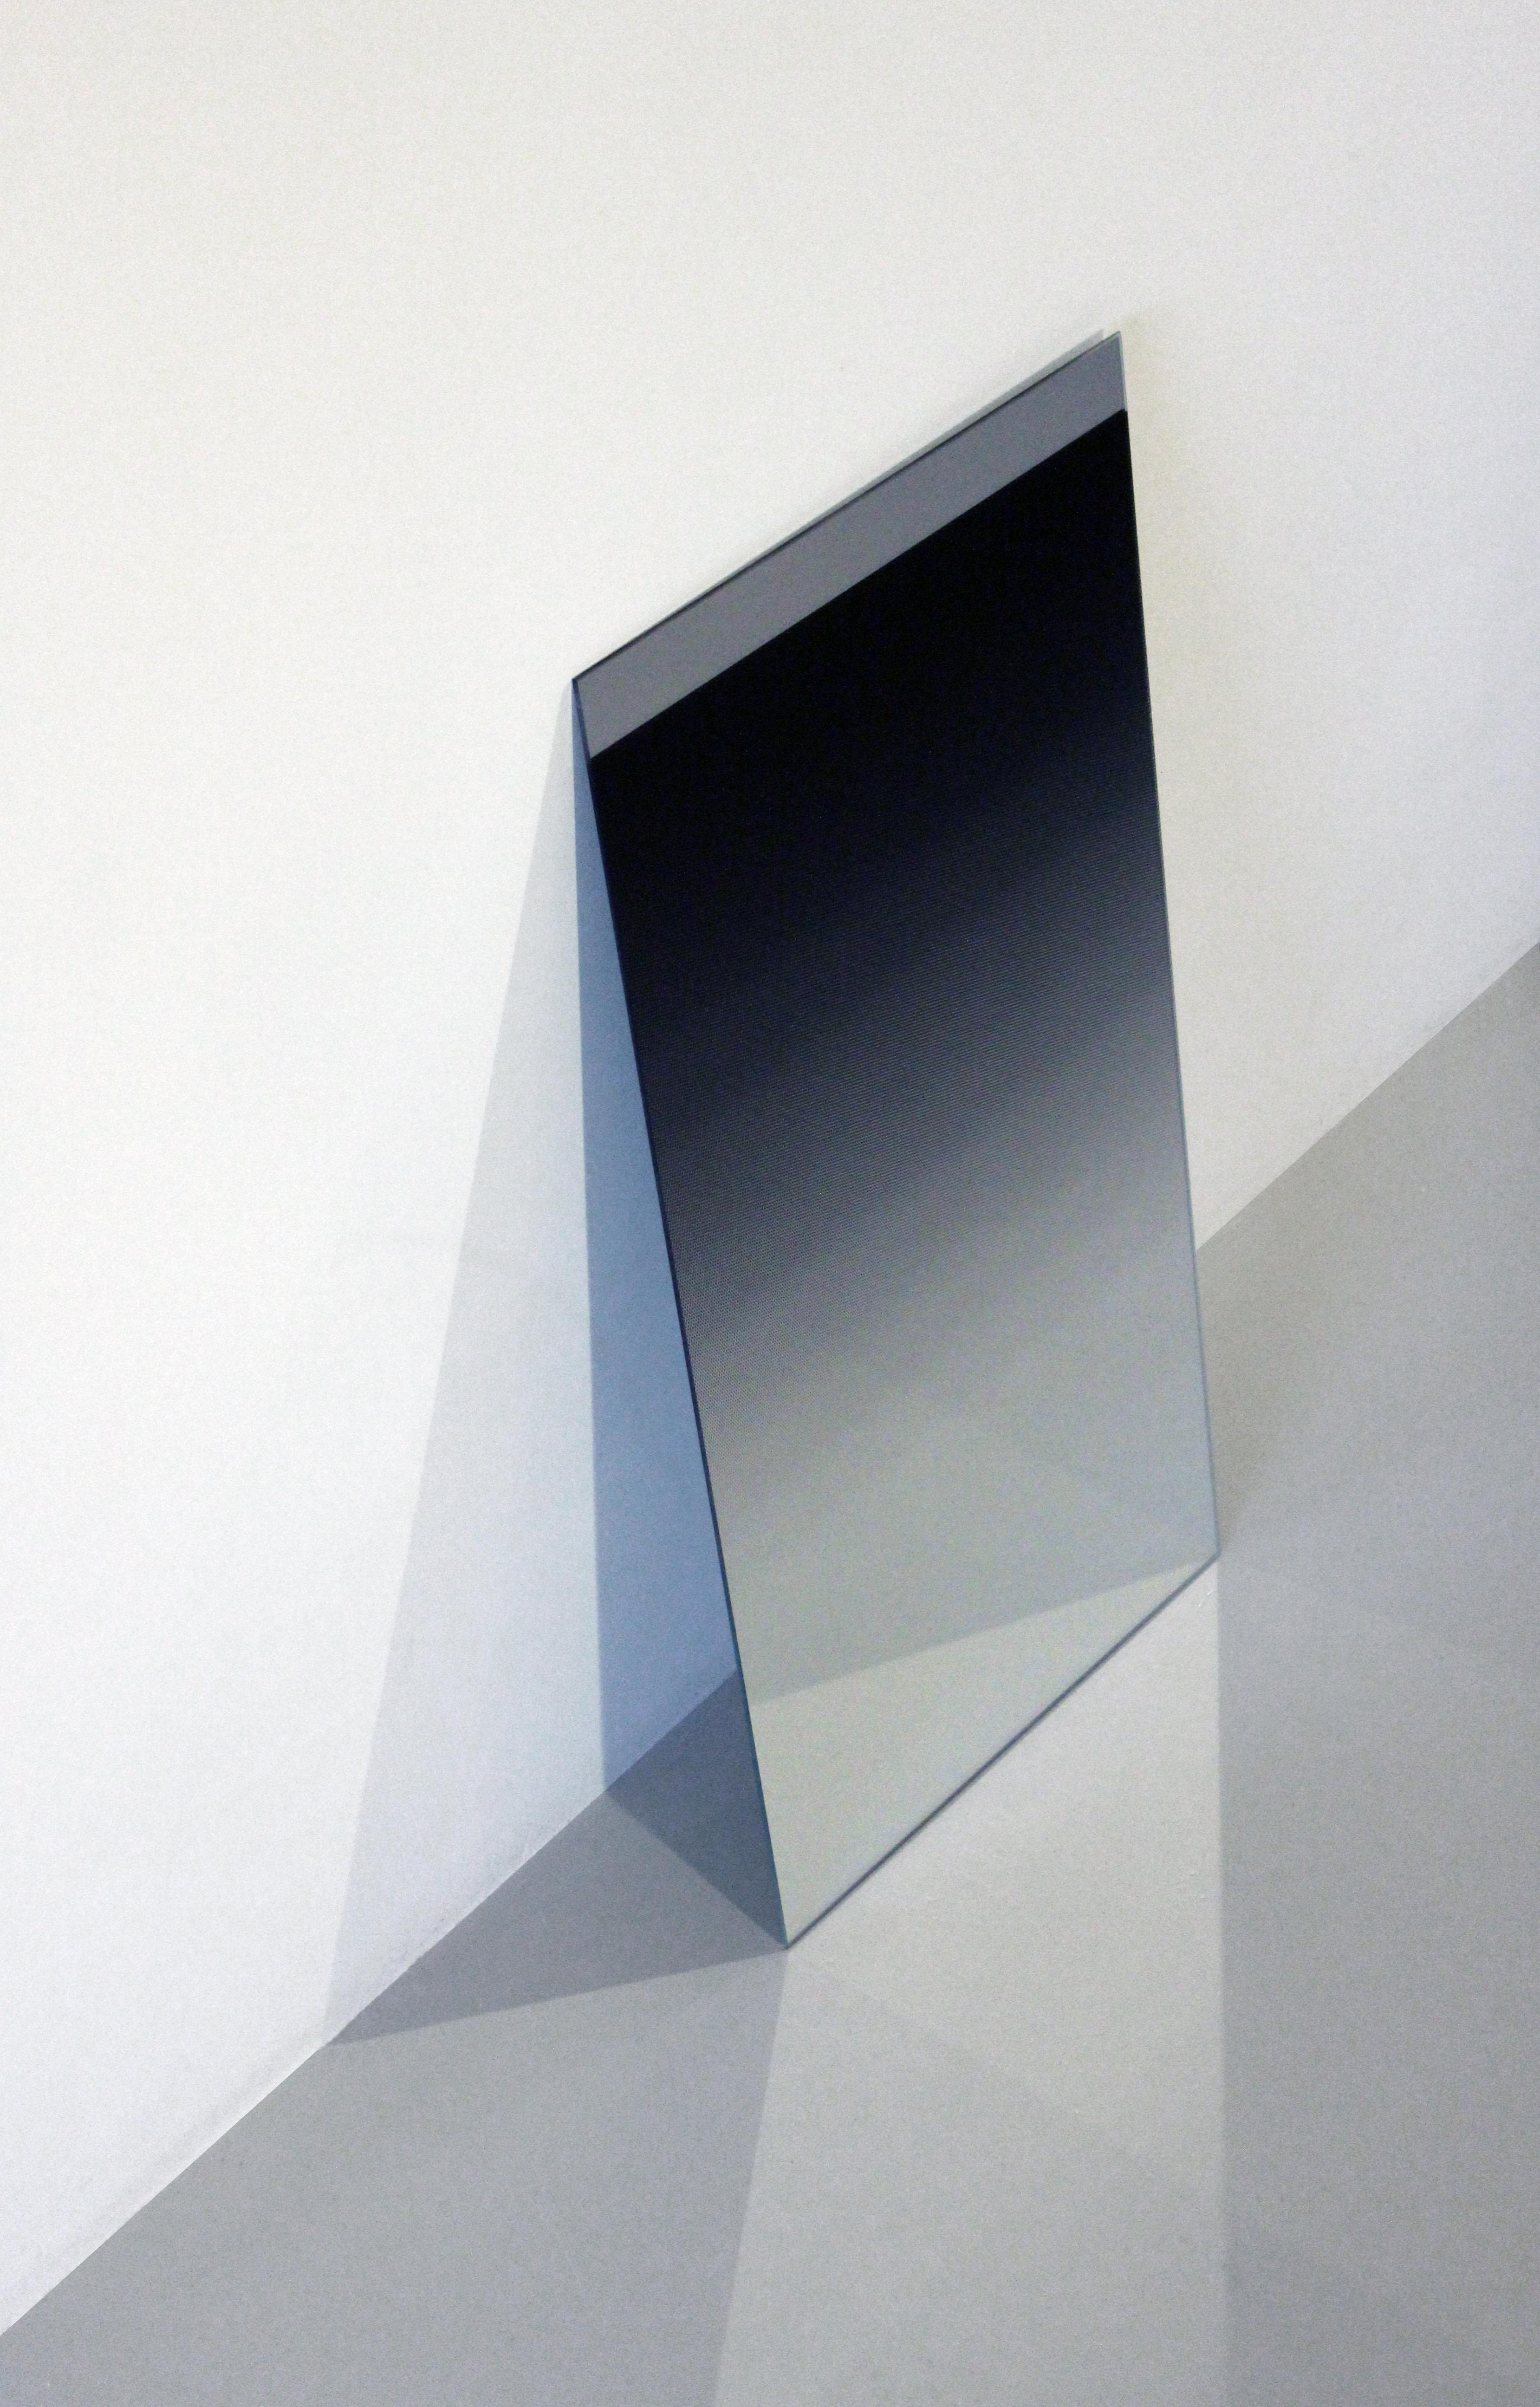 SPIEGELbluesky01_schmitz30cmx60cm